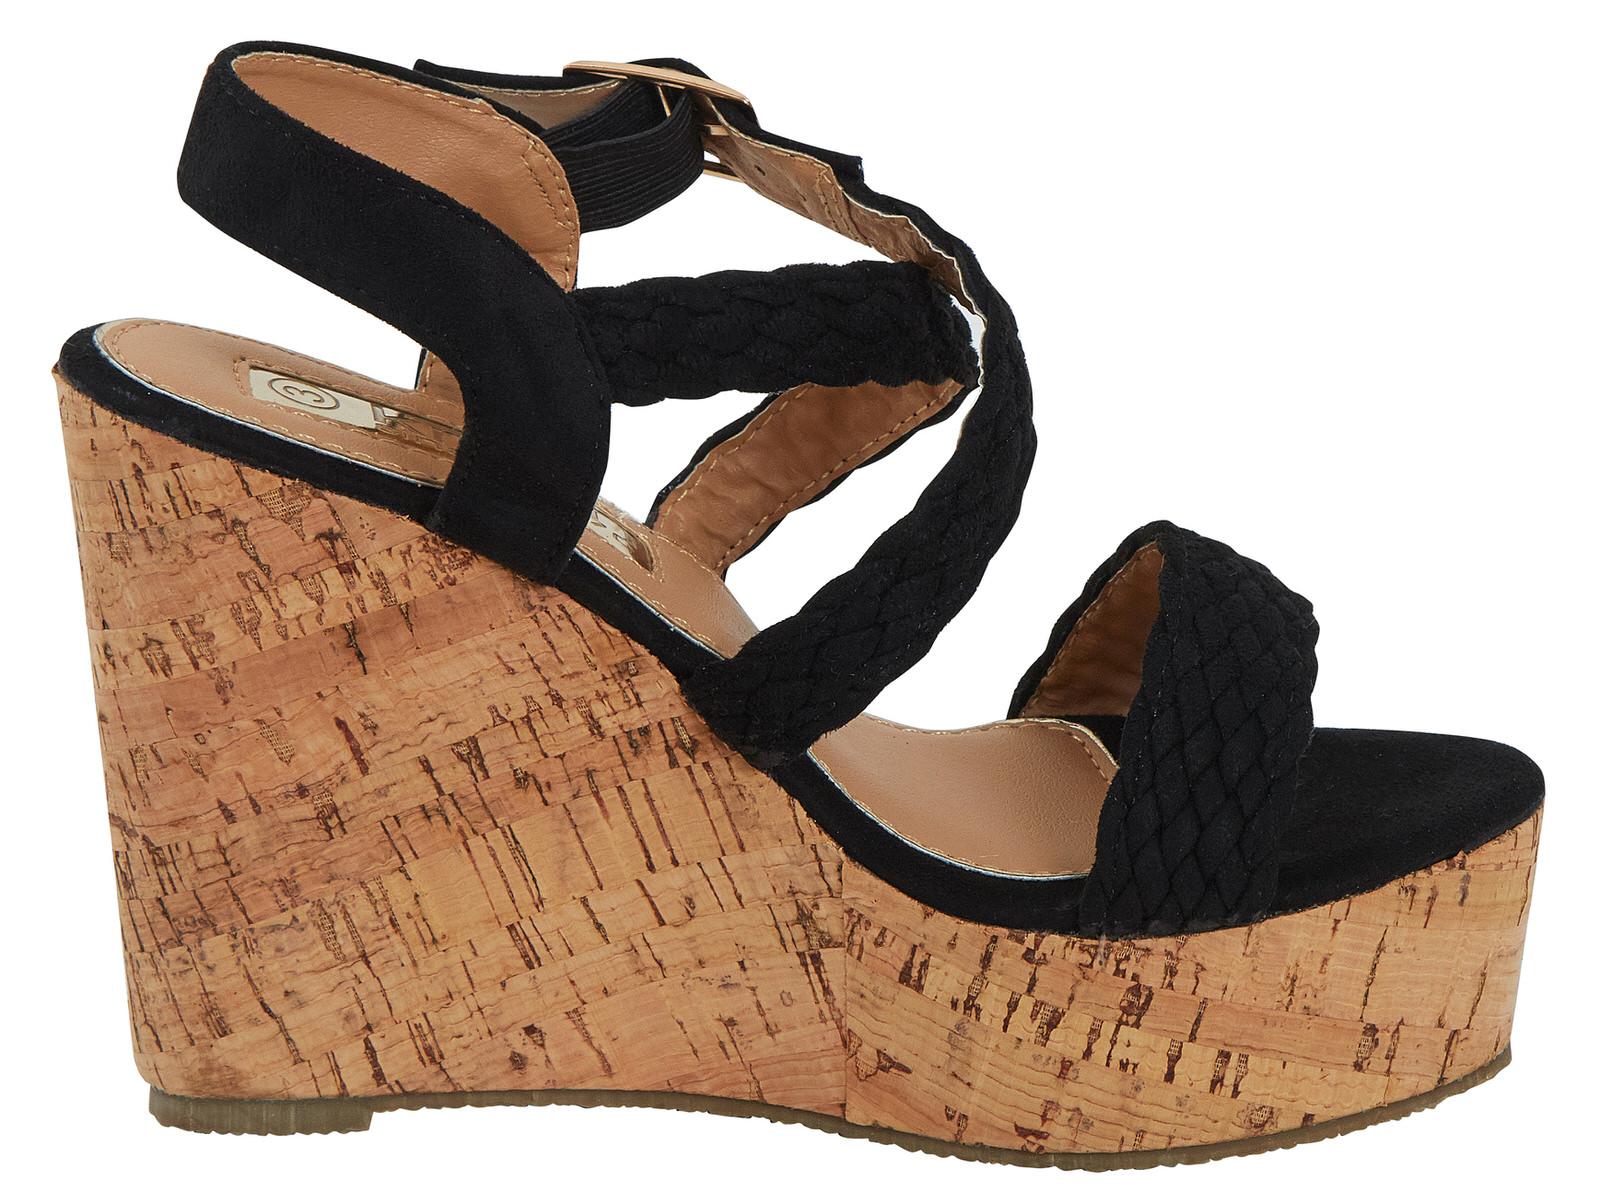 b6c74c9b63e Details about Womens Espadrille Cork Wedges Crossover Strappy Heels  Platforms Sandals Size